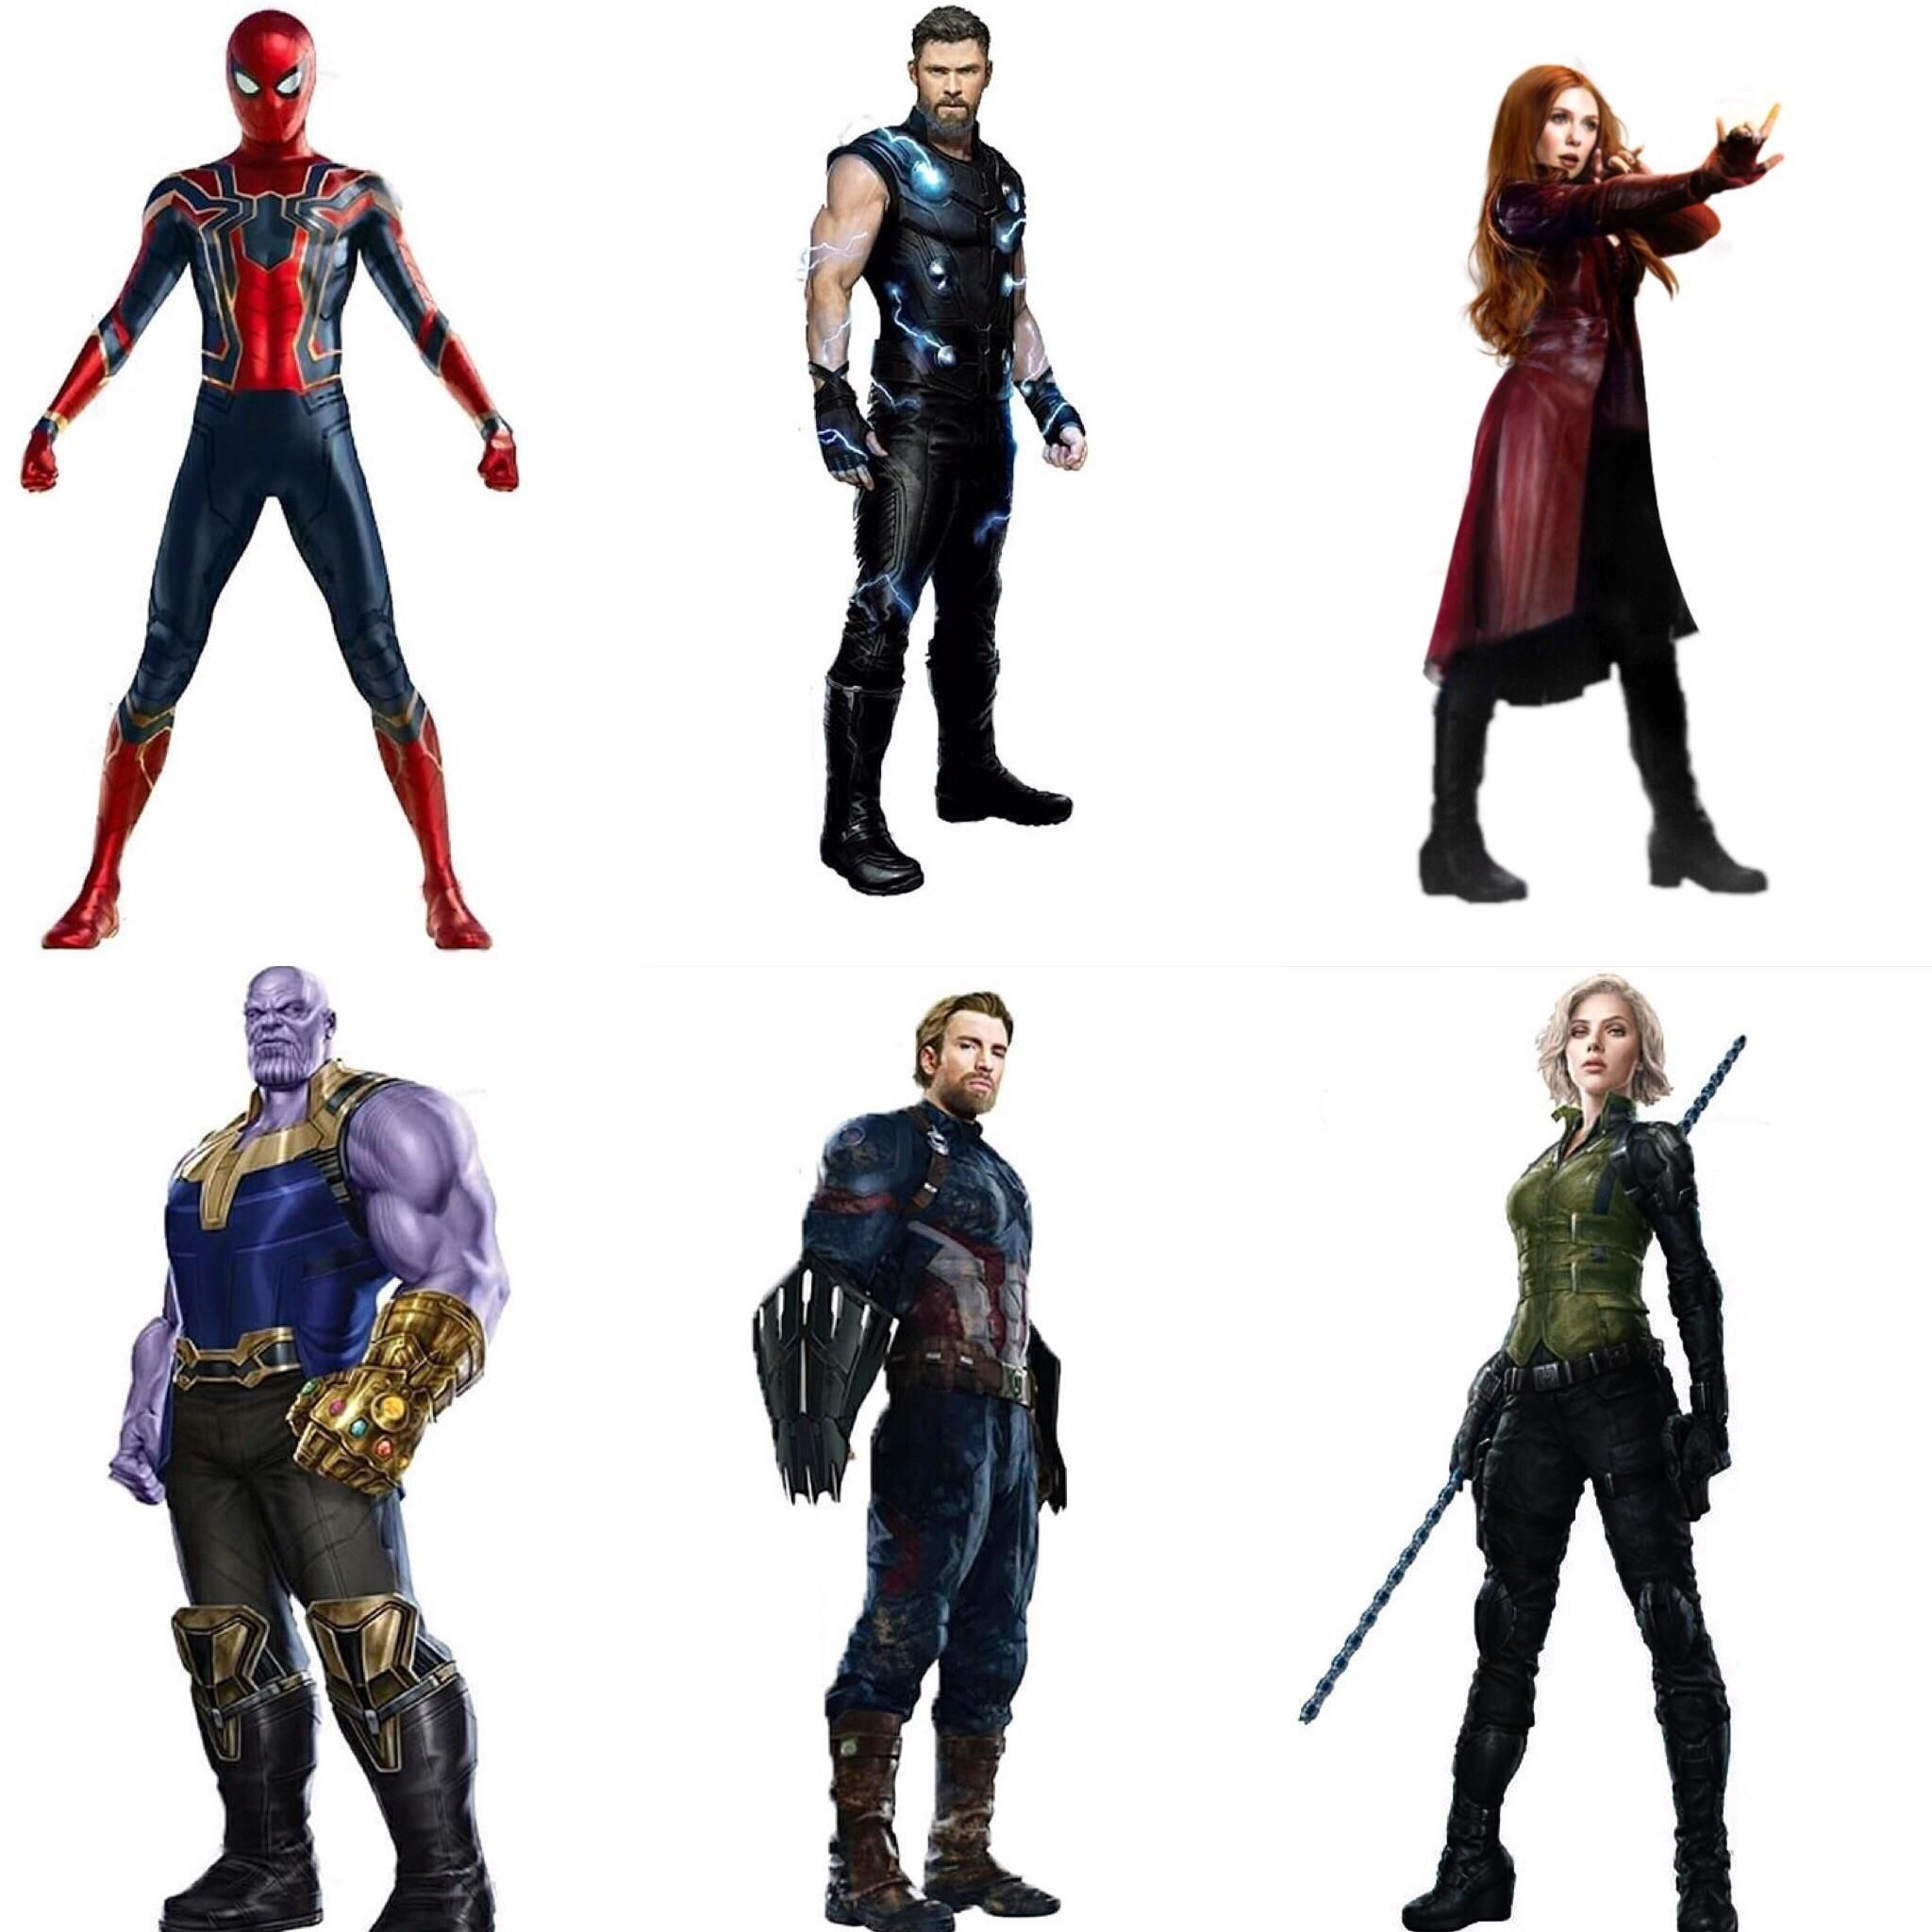 Avengers Infinity War character art!.